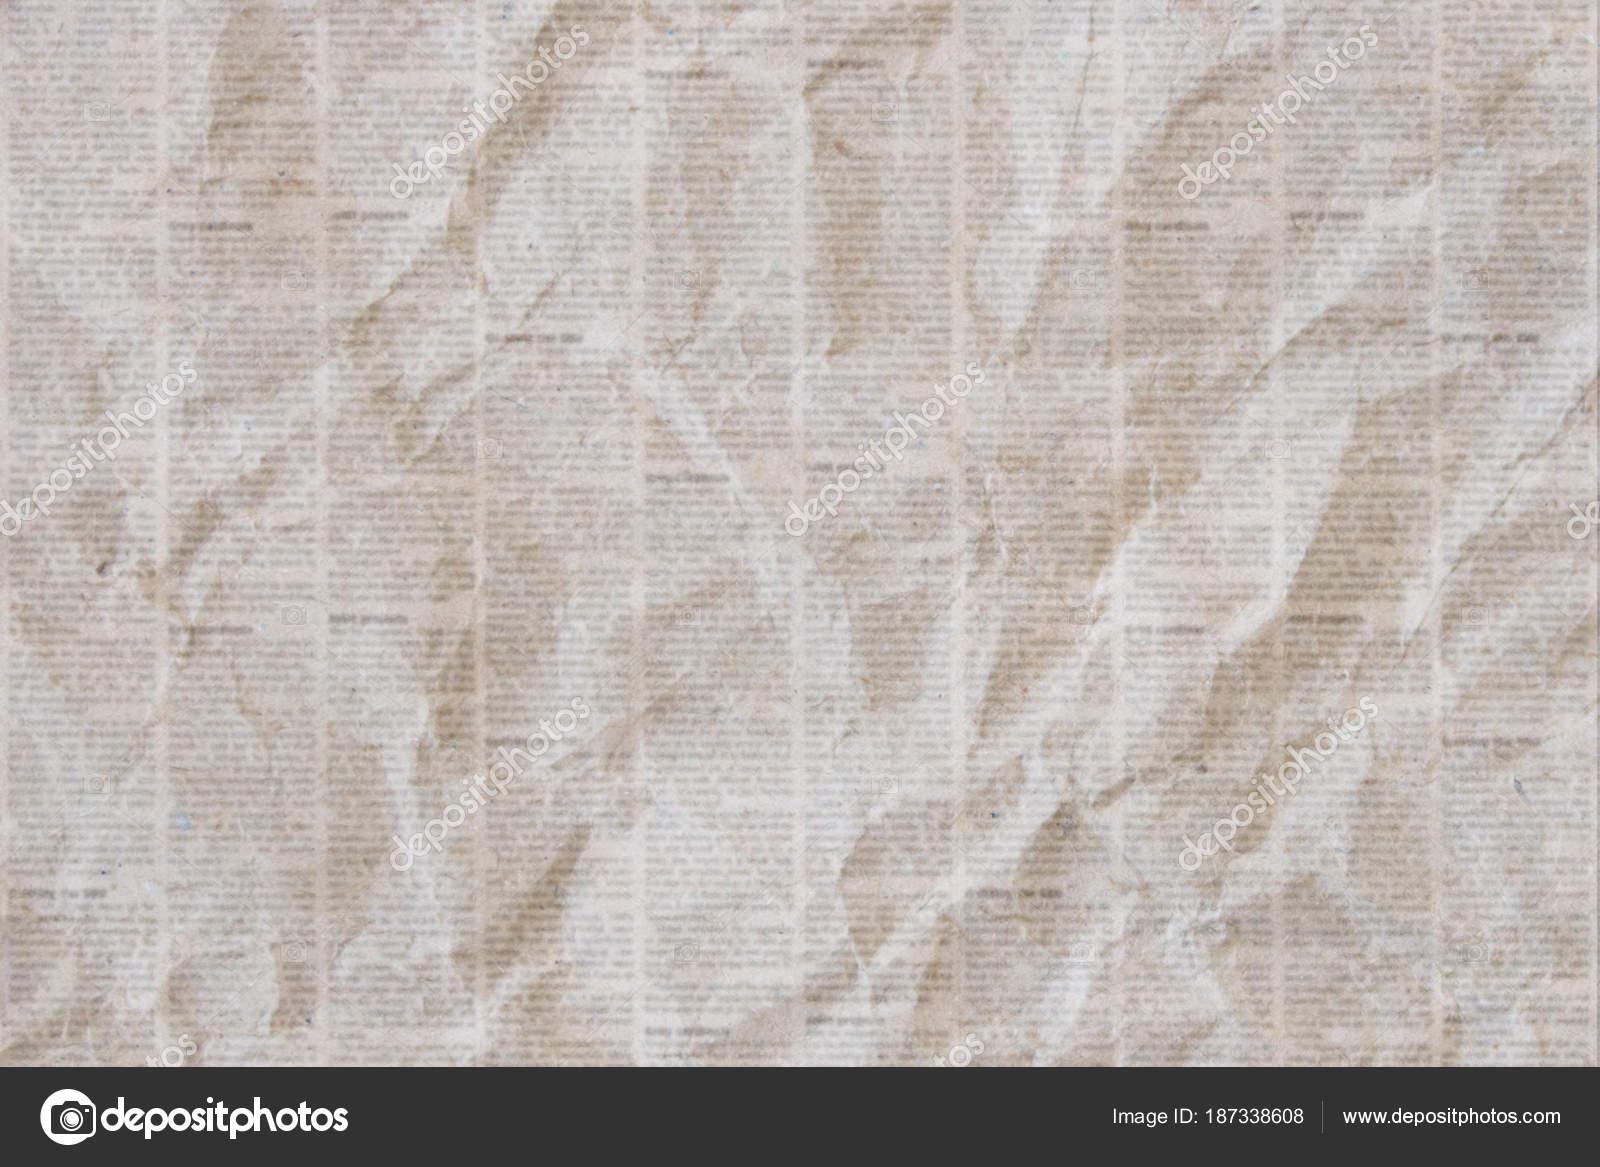 Fondo Papel De Diario Fondo De Textura De Periódico Arrugado